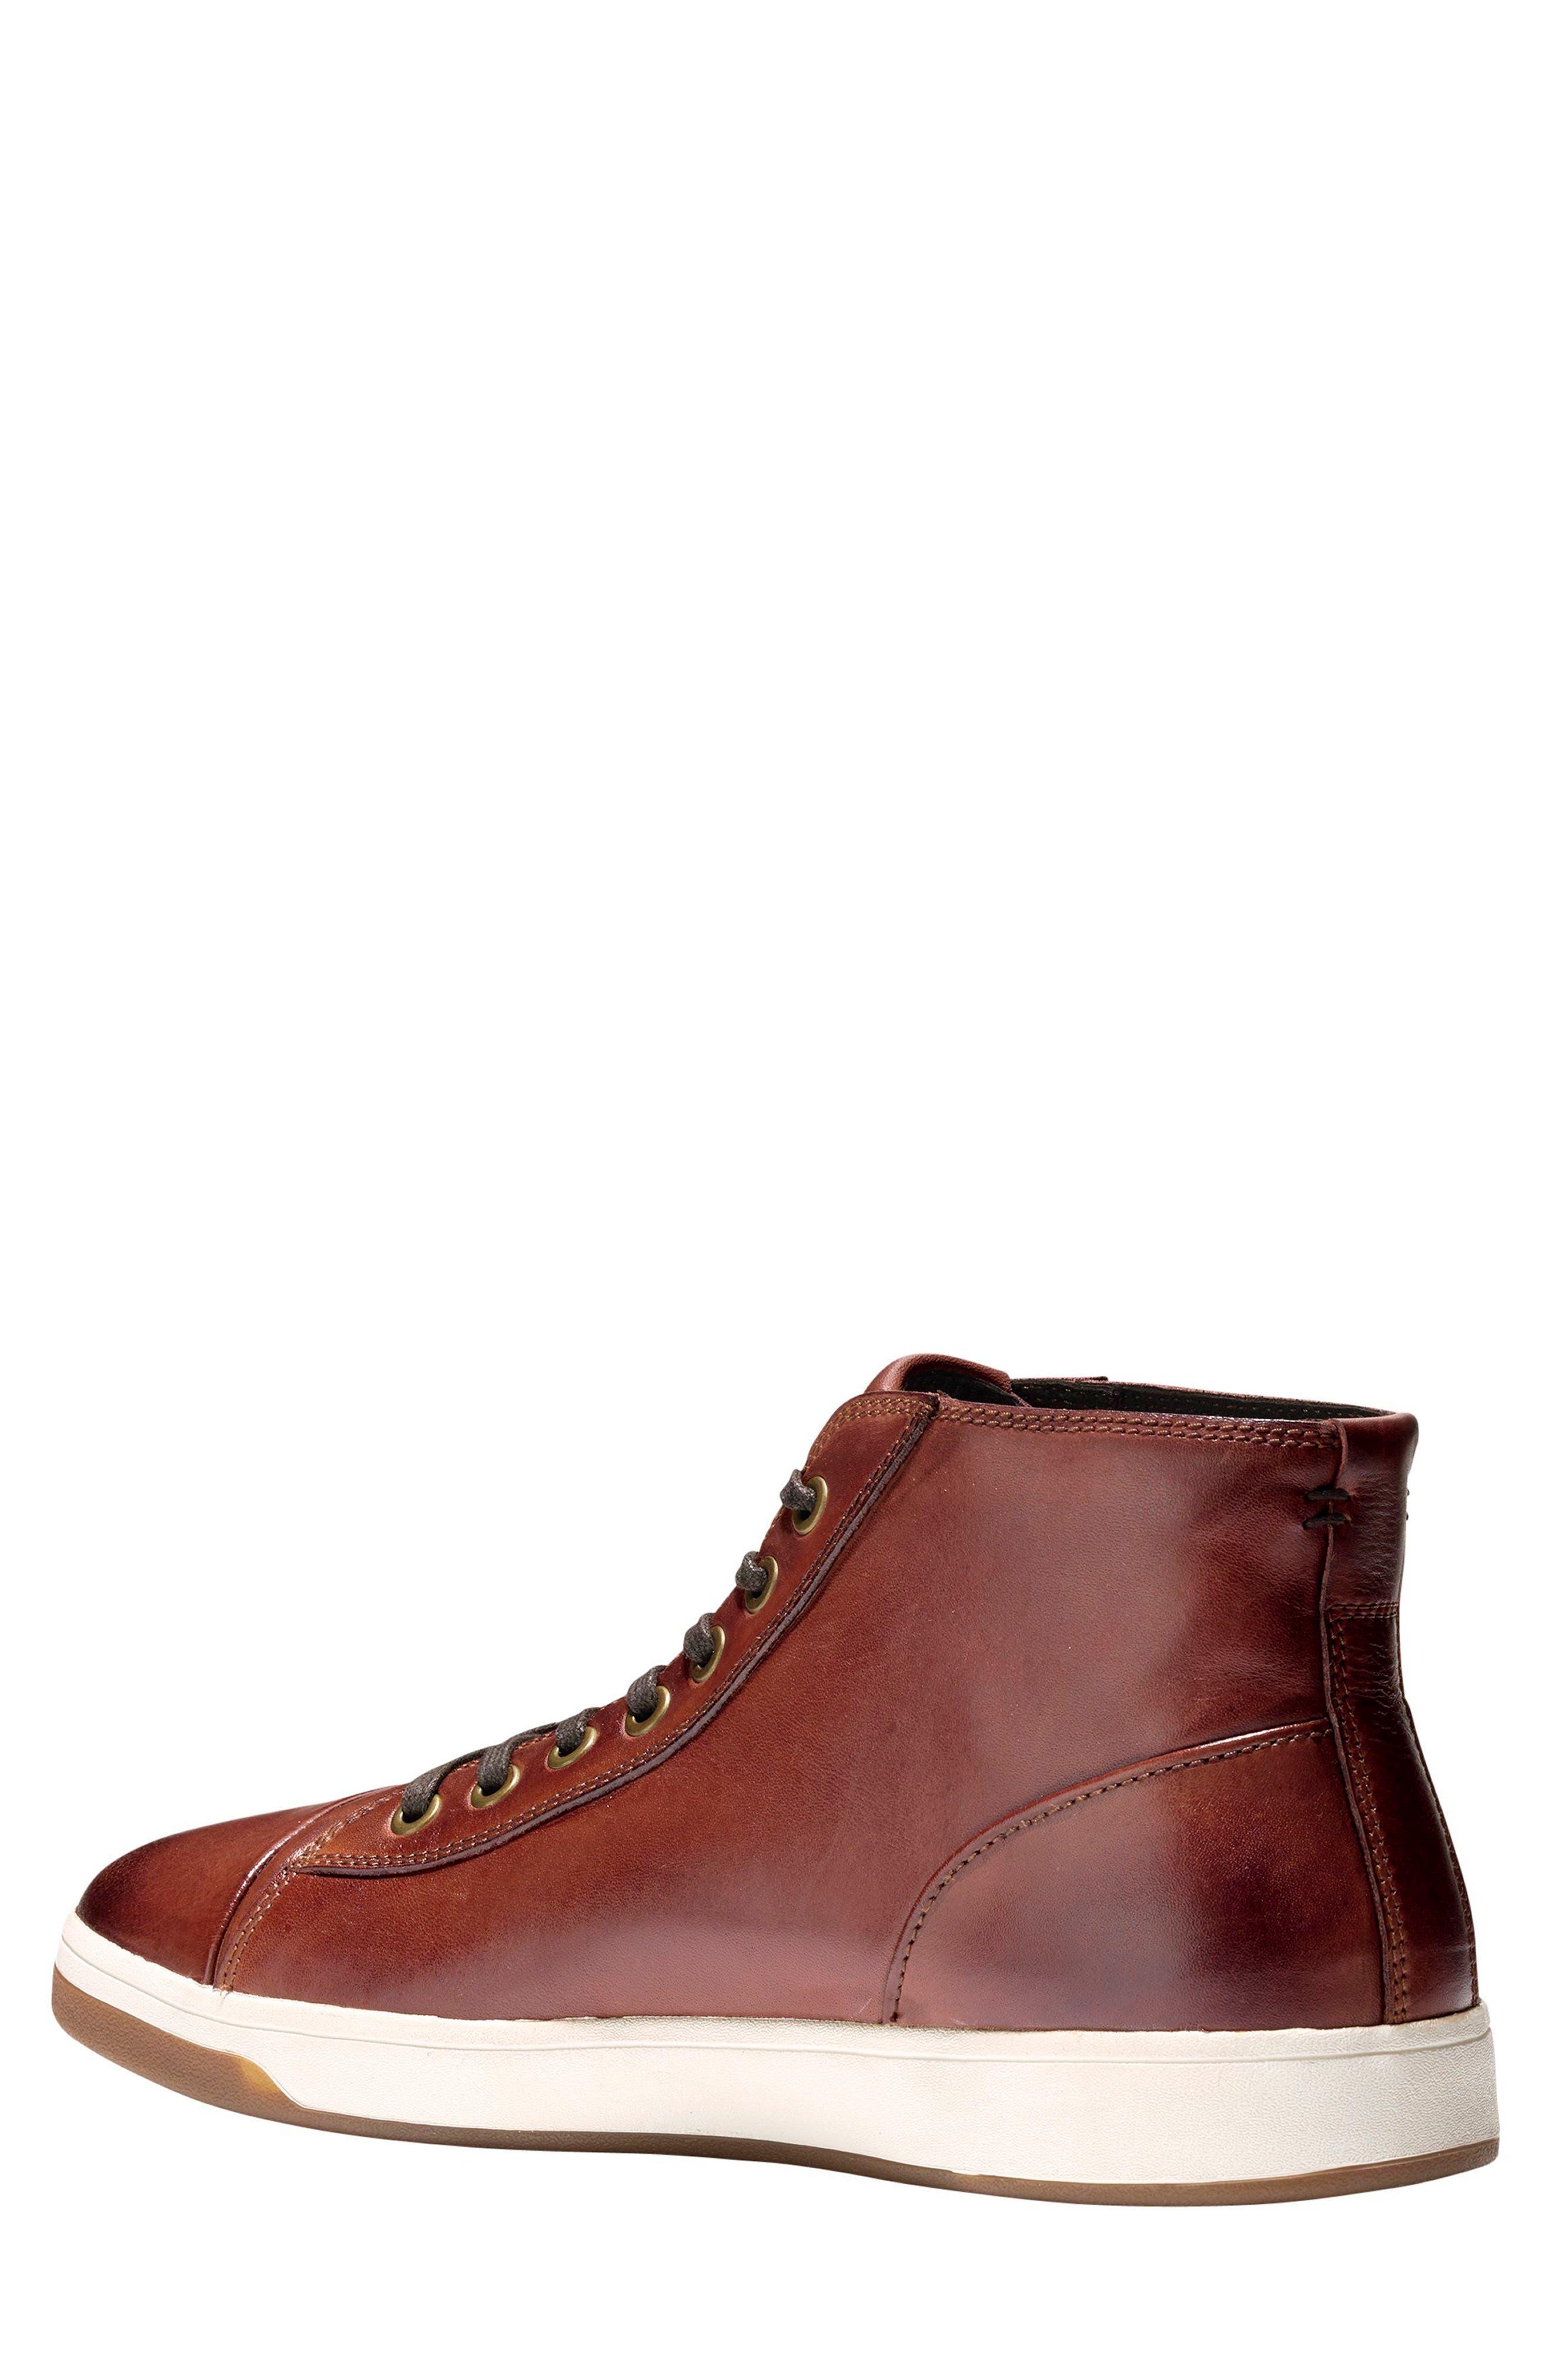 GrandPro High Top Sneaker,                             Alternate thumbnail 3, color,